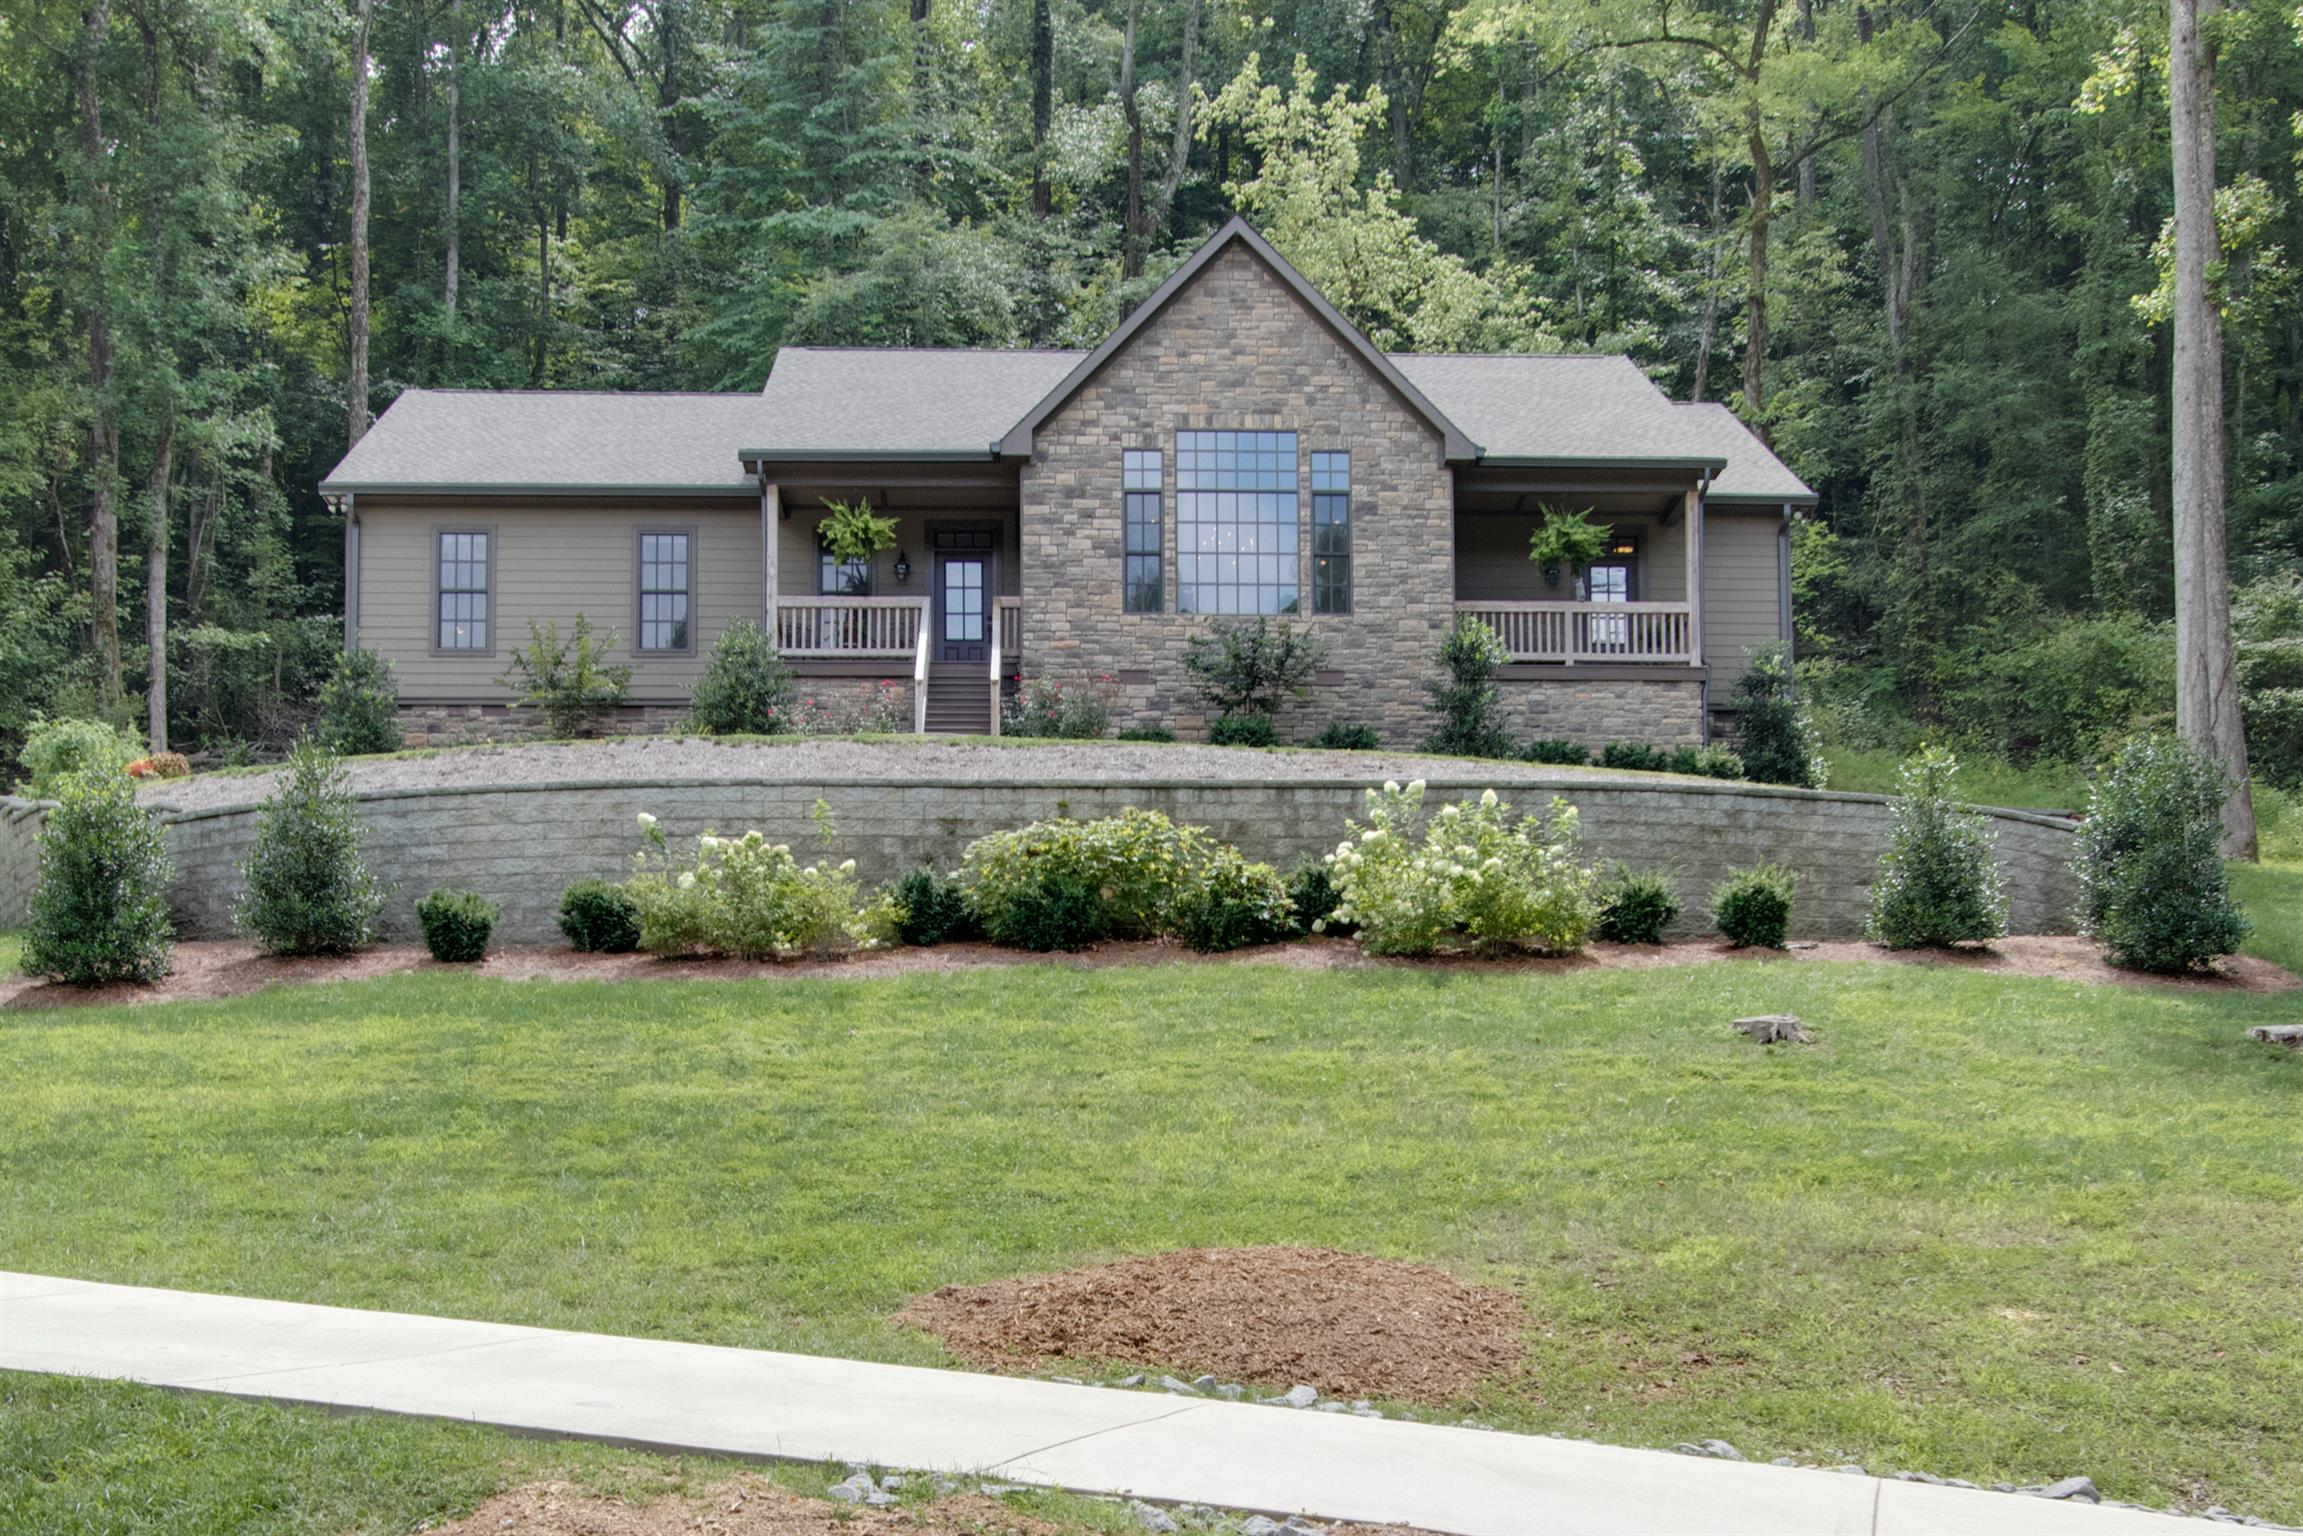 178 Baymont Dr, Lancaster, TN 38569 - Lancaster, TN real estate listing